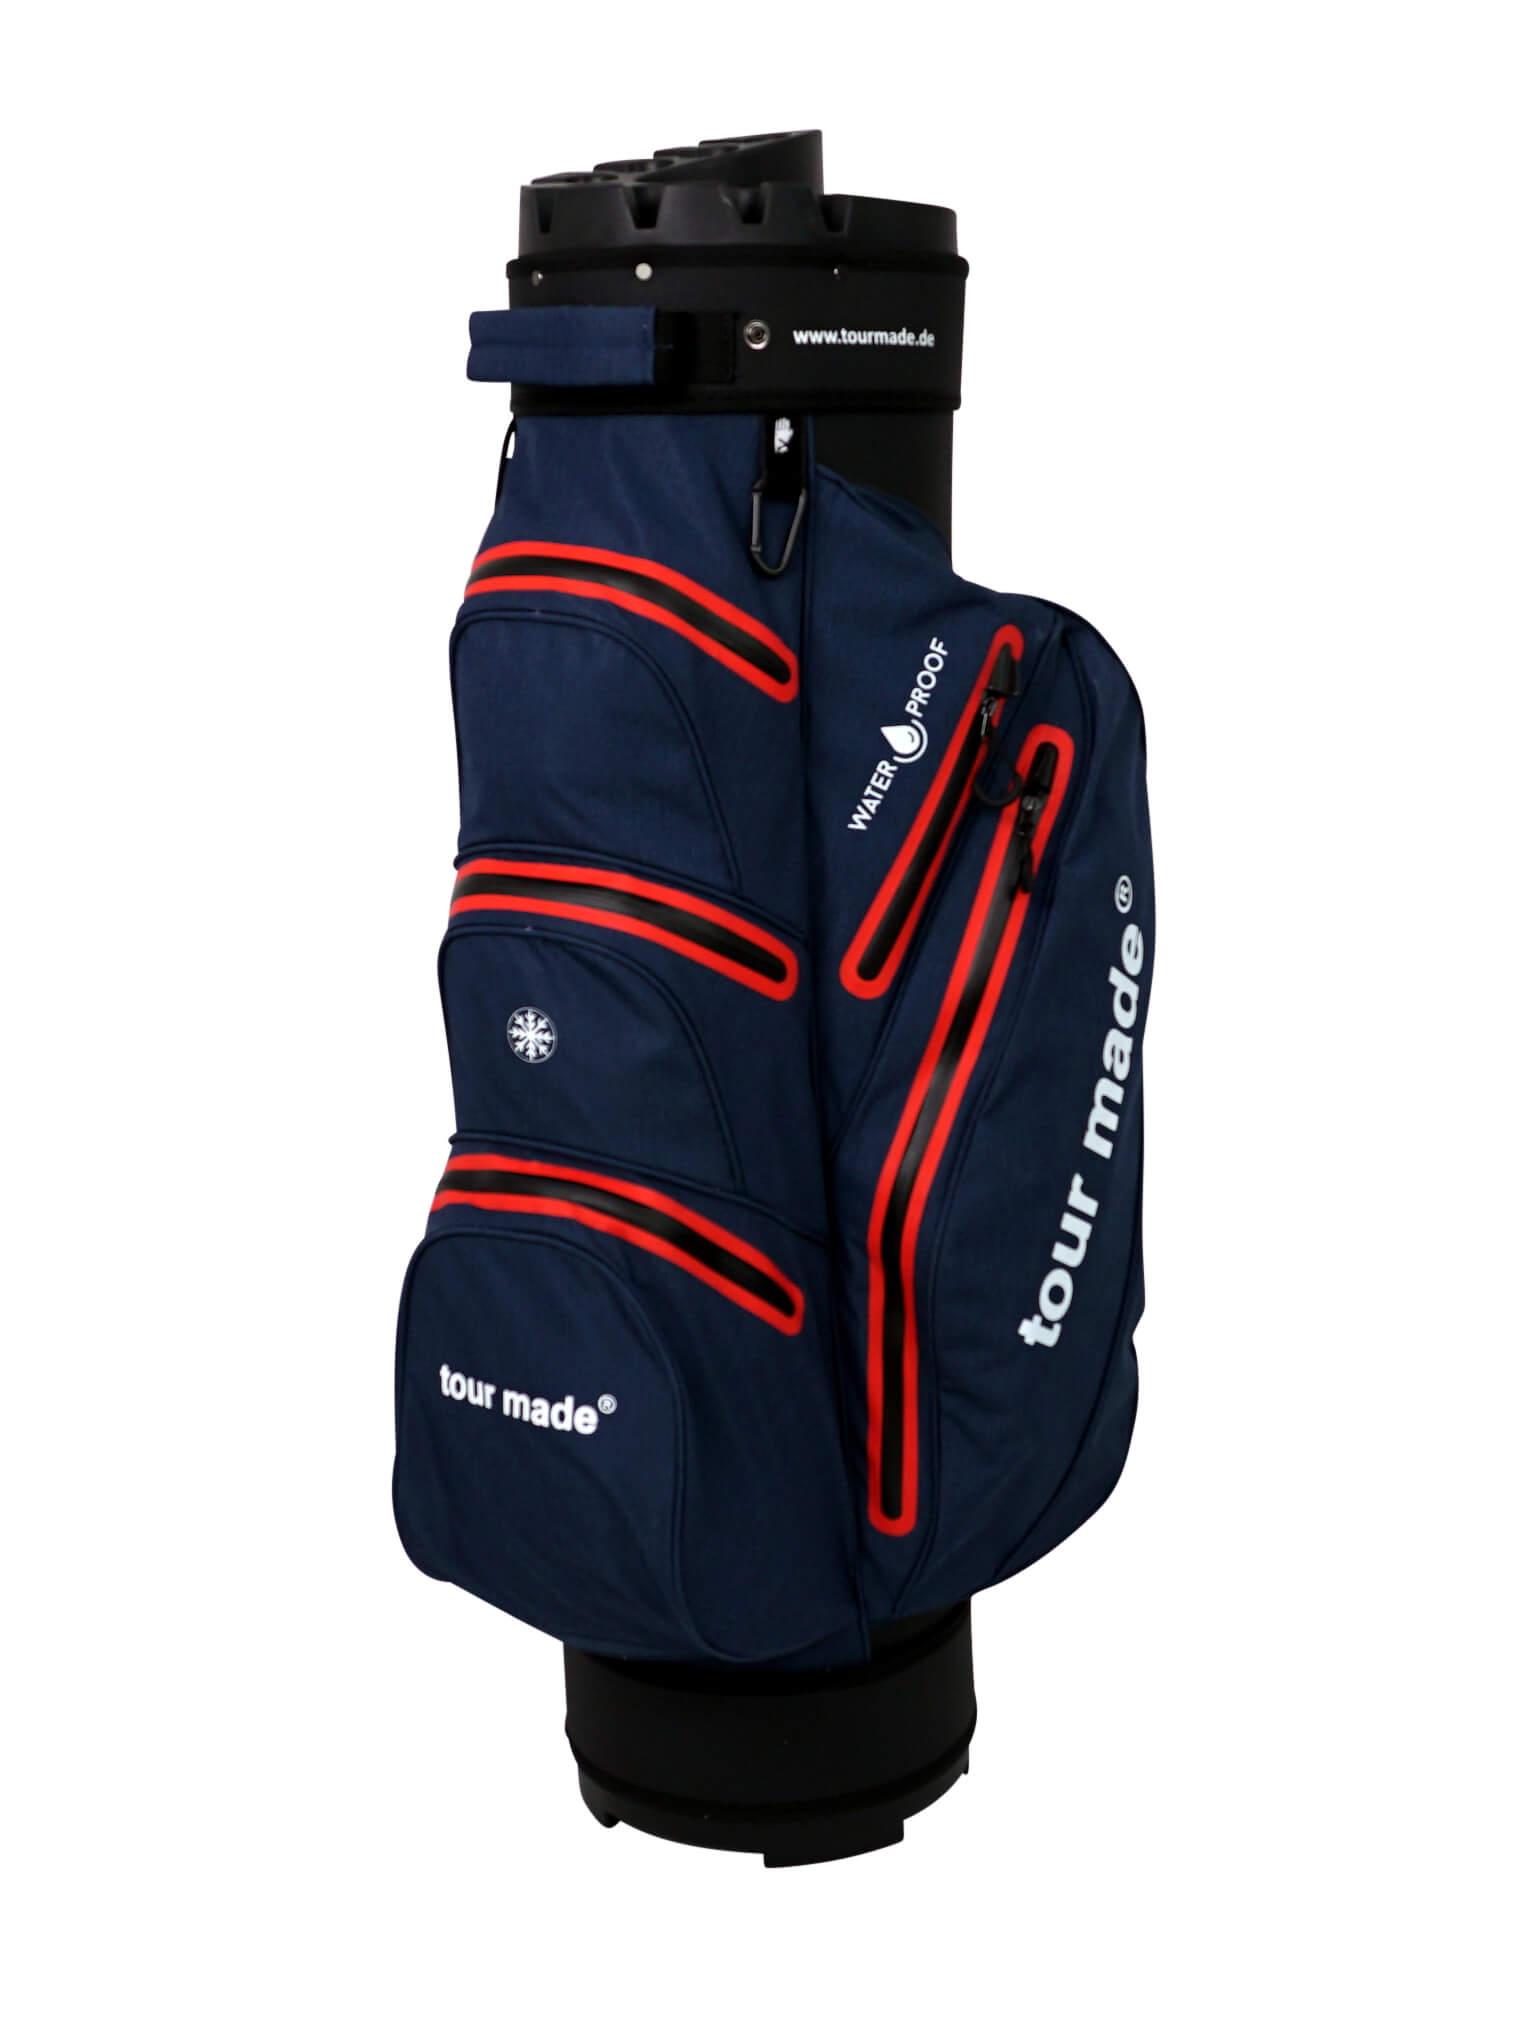 Tour Made Waterproof WP14 TEX Organizer Golftasche